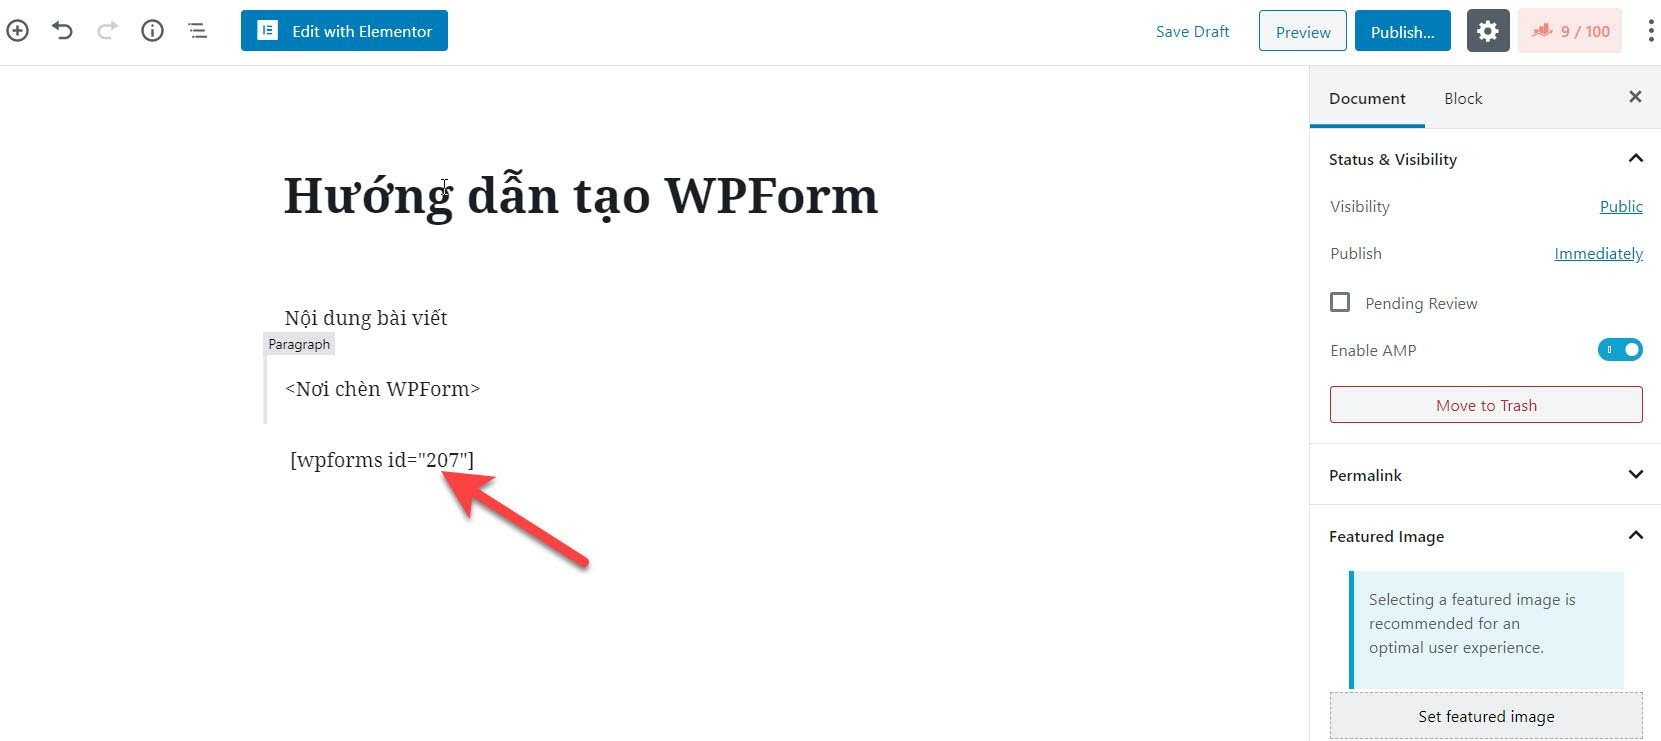 Chen WPForm vao bai viet tren WP